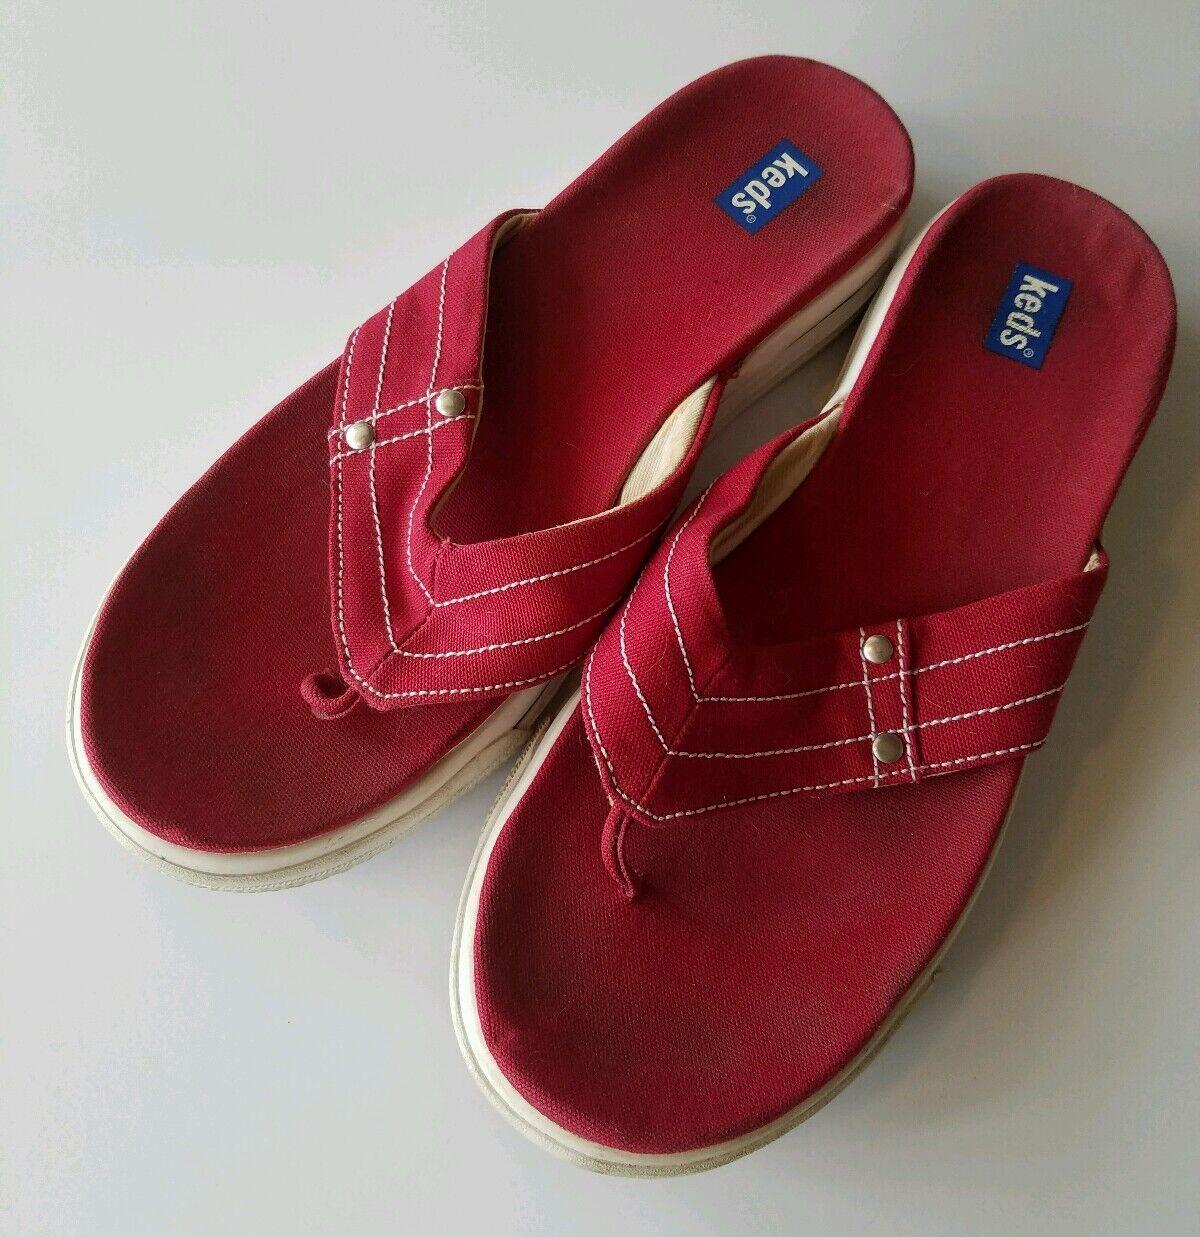 VINTAGE KEDS WOMANS SANDAL FLIP FLOPS womens SIZE 9 sneaker stlye red